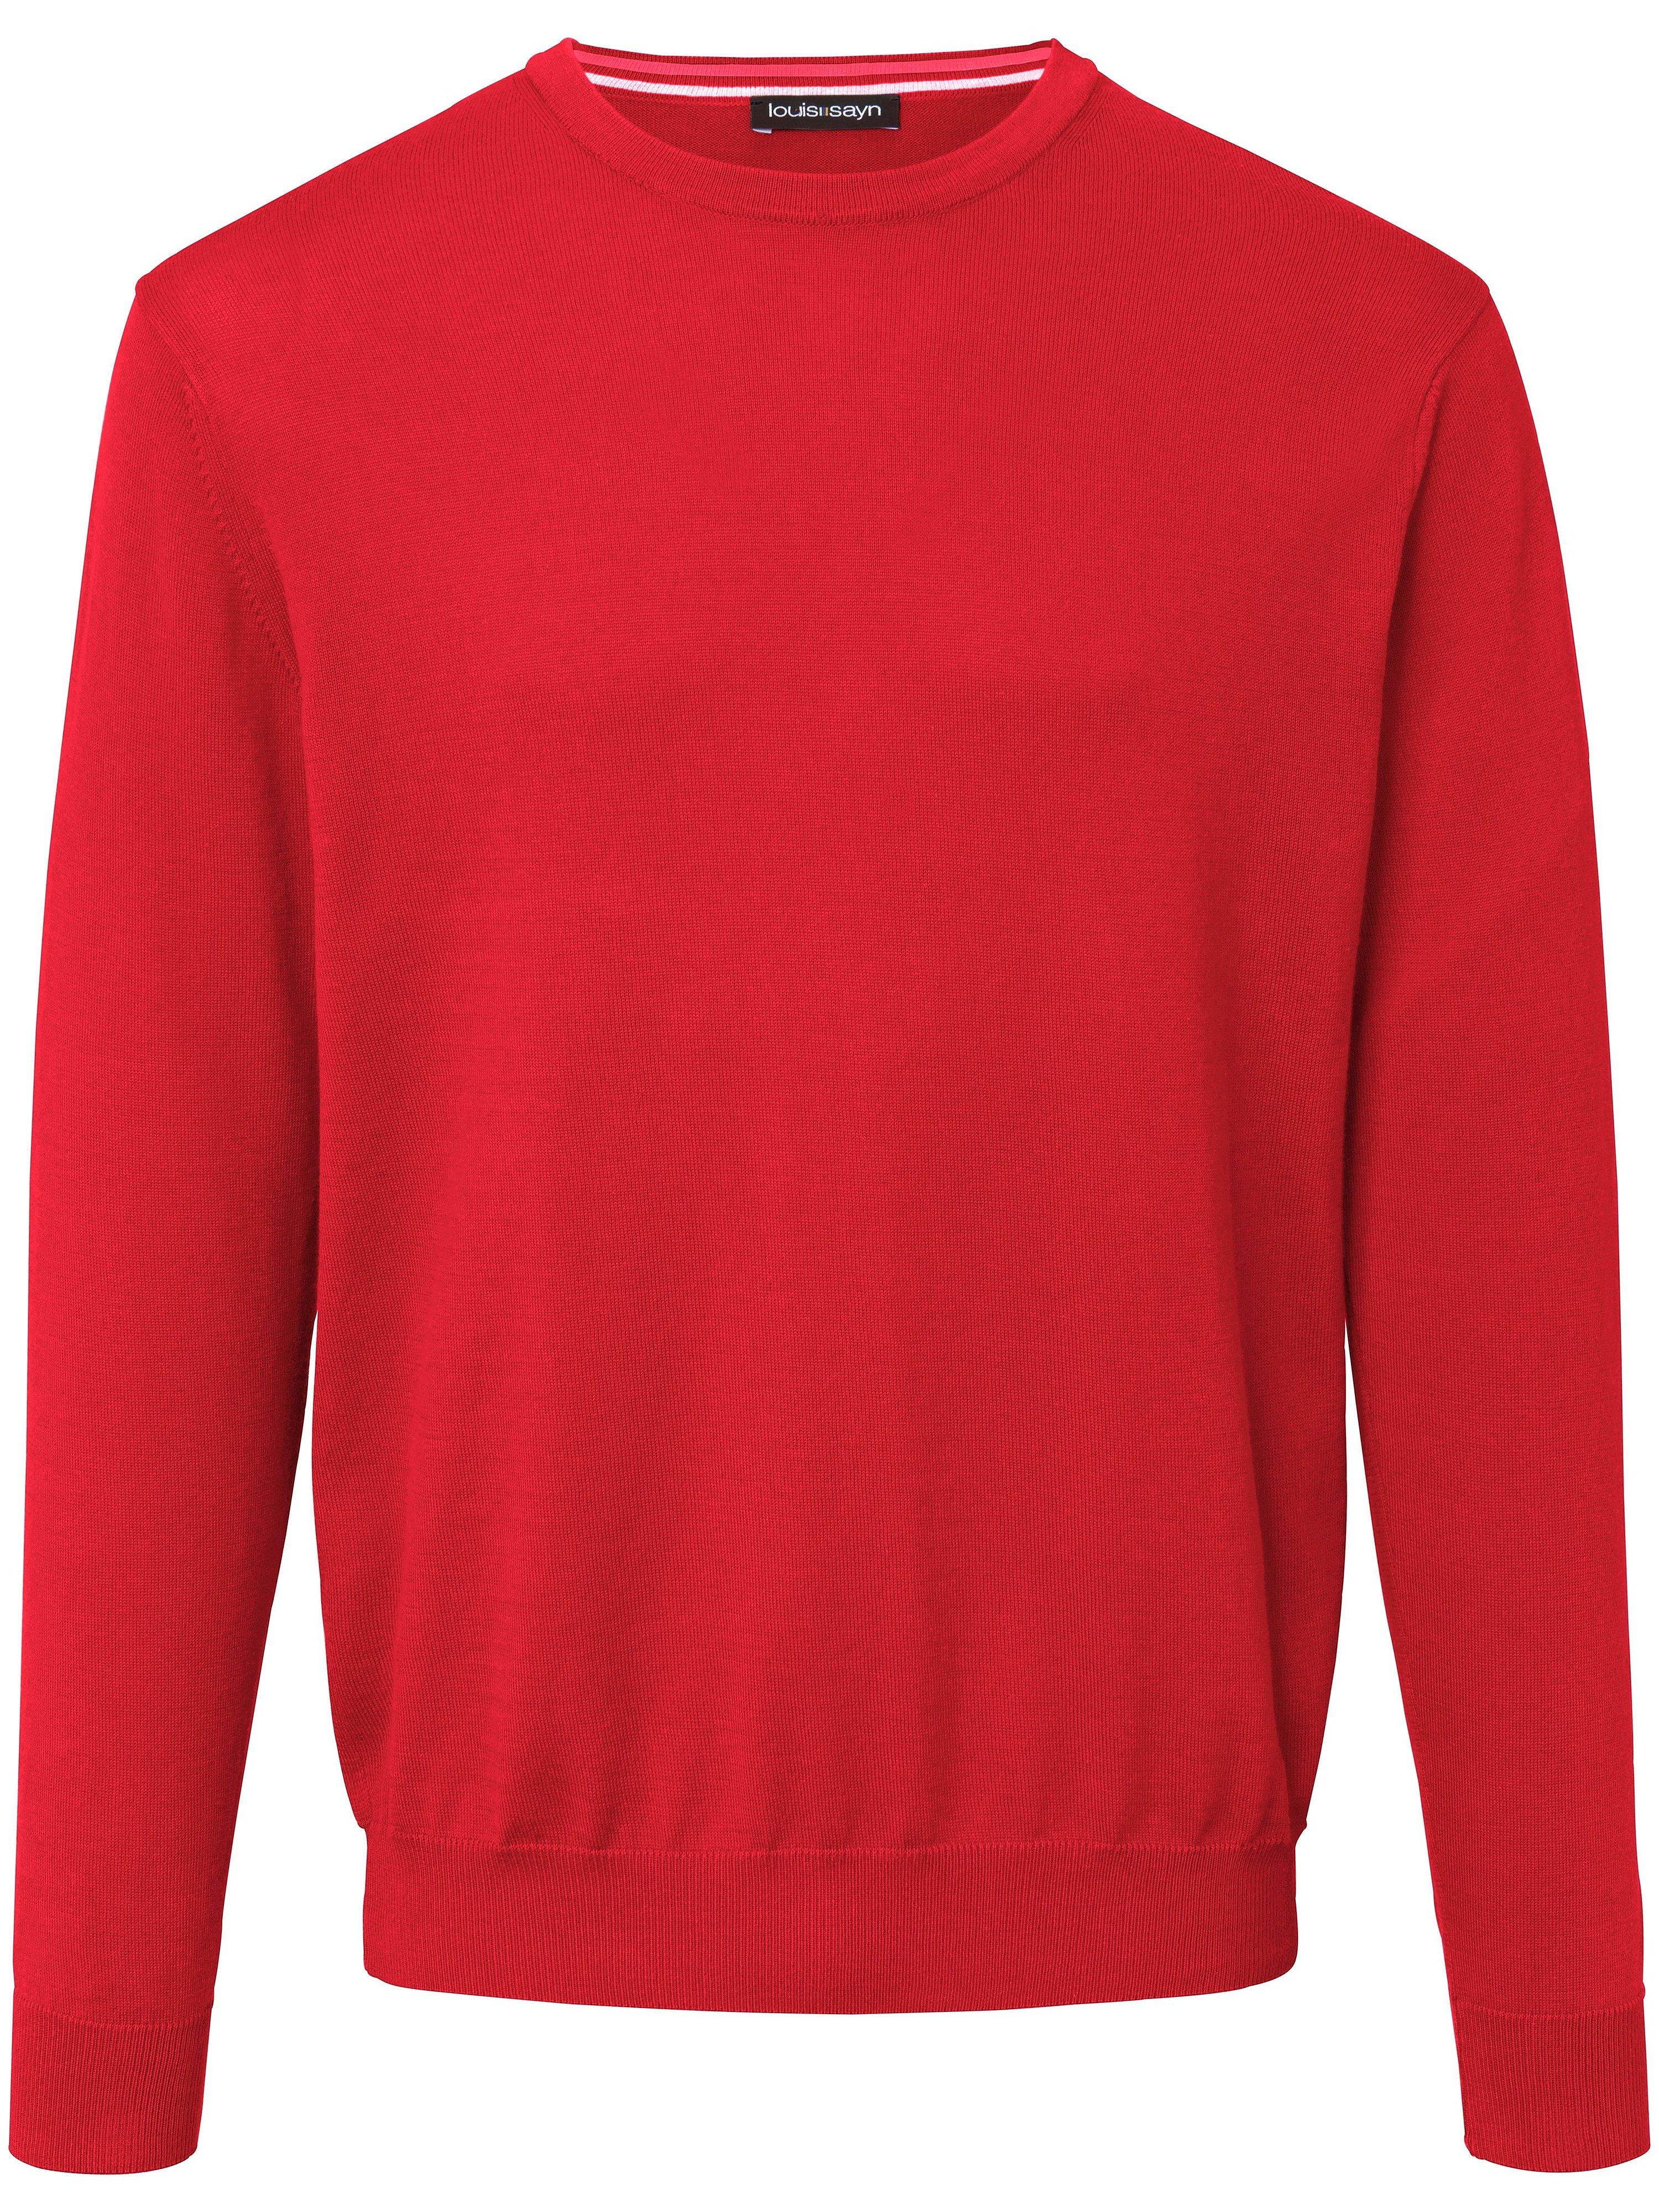 louis sayn - Pullover aus 100% Baumwolle Pima Cotton  rot